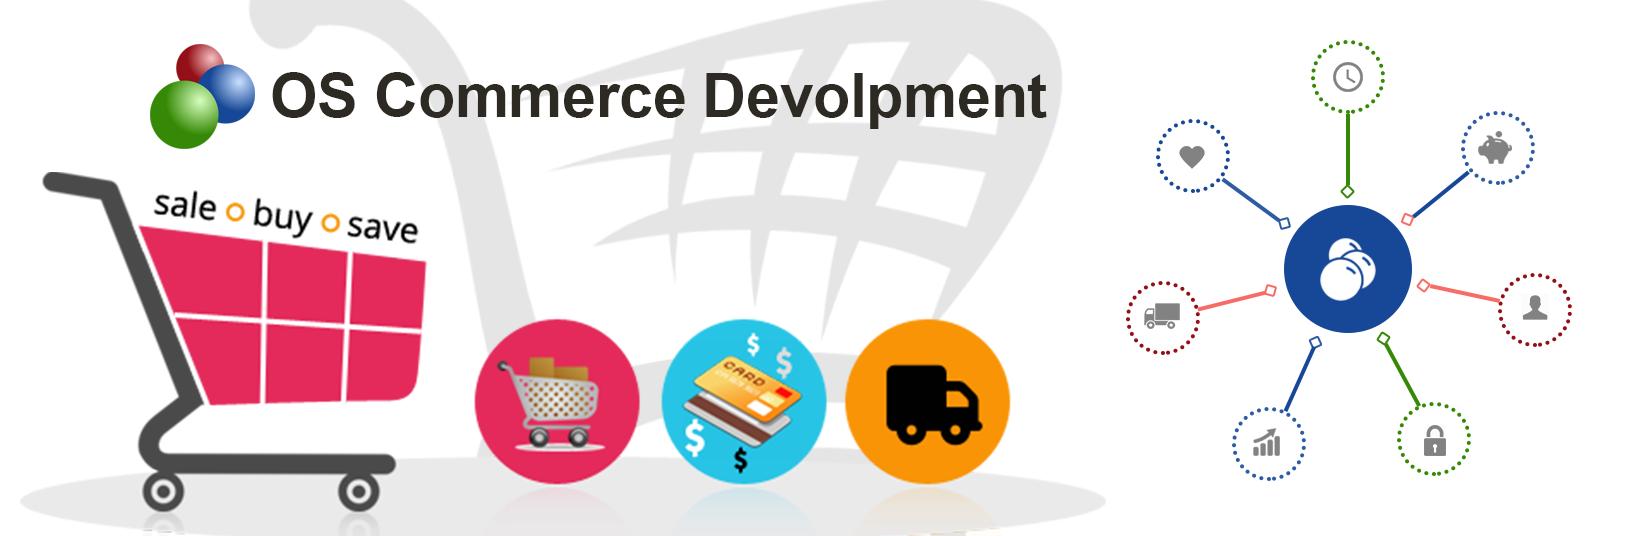 OsCommerce Web Development